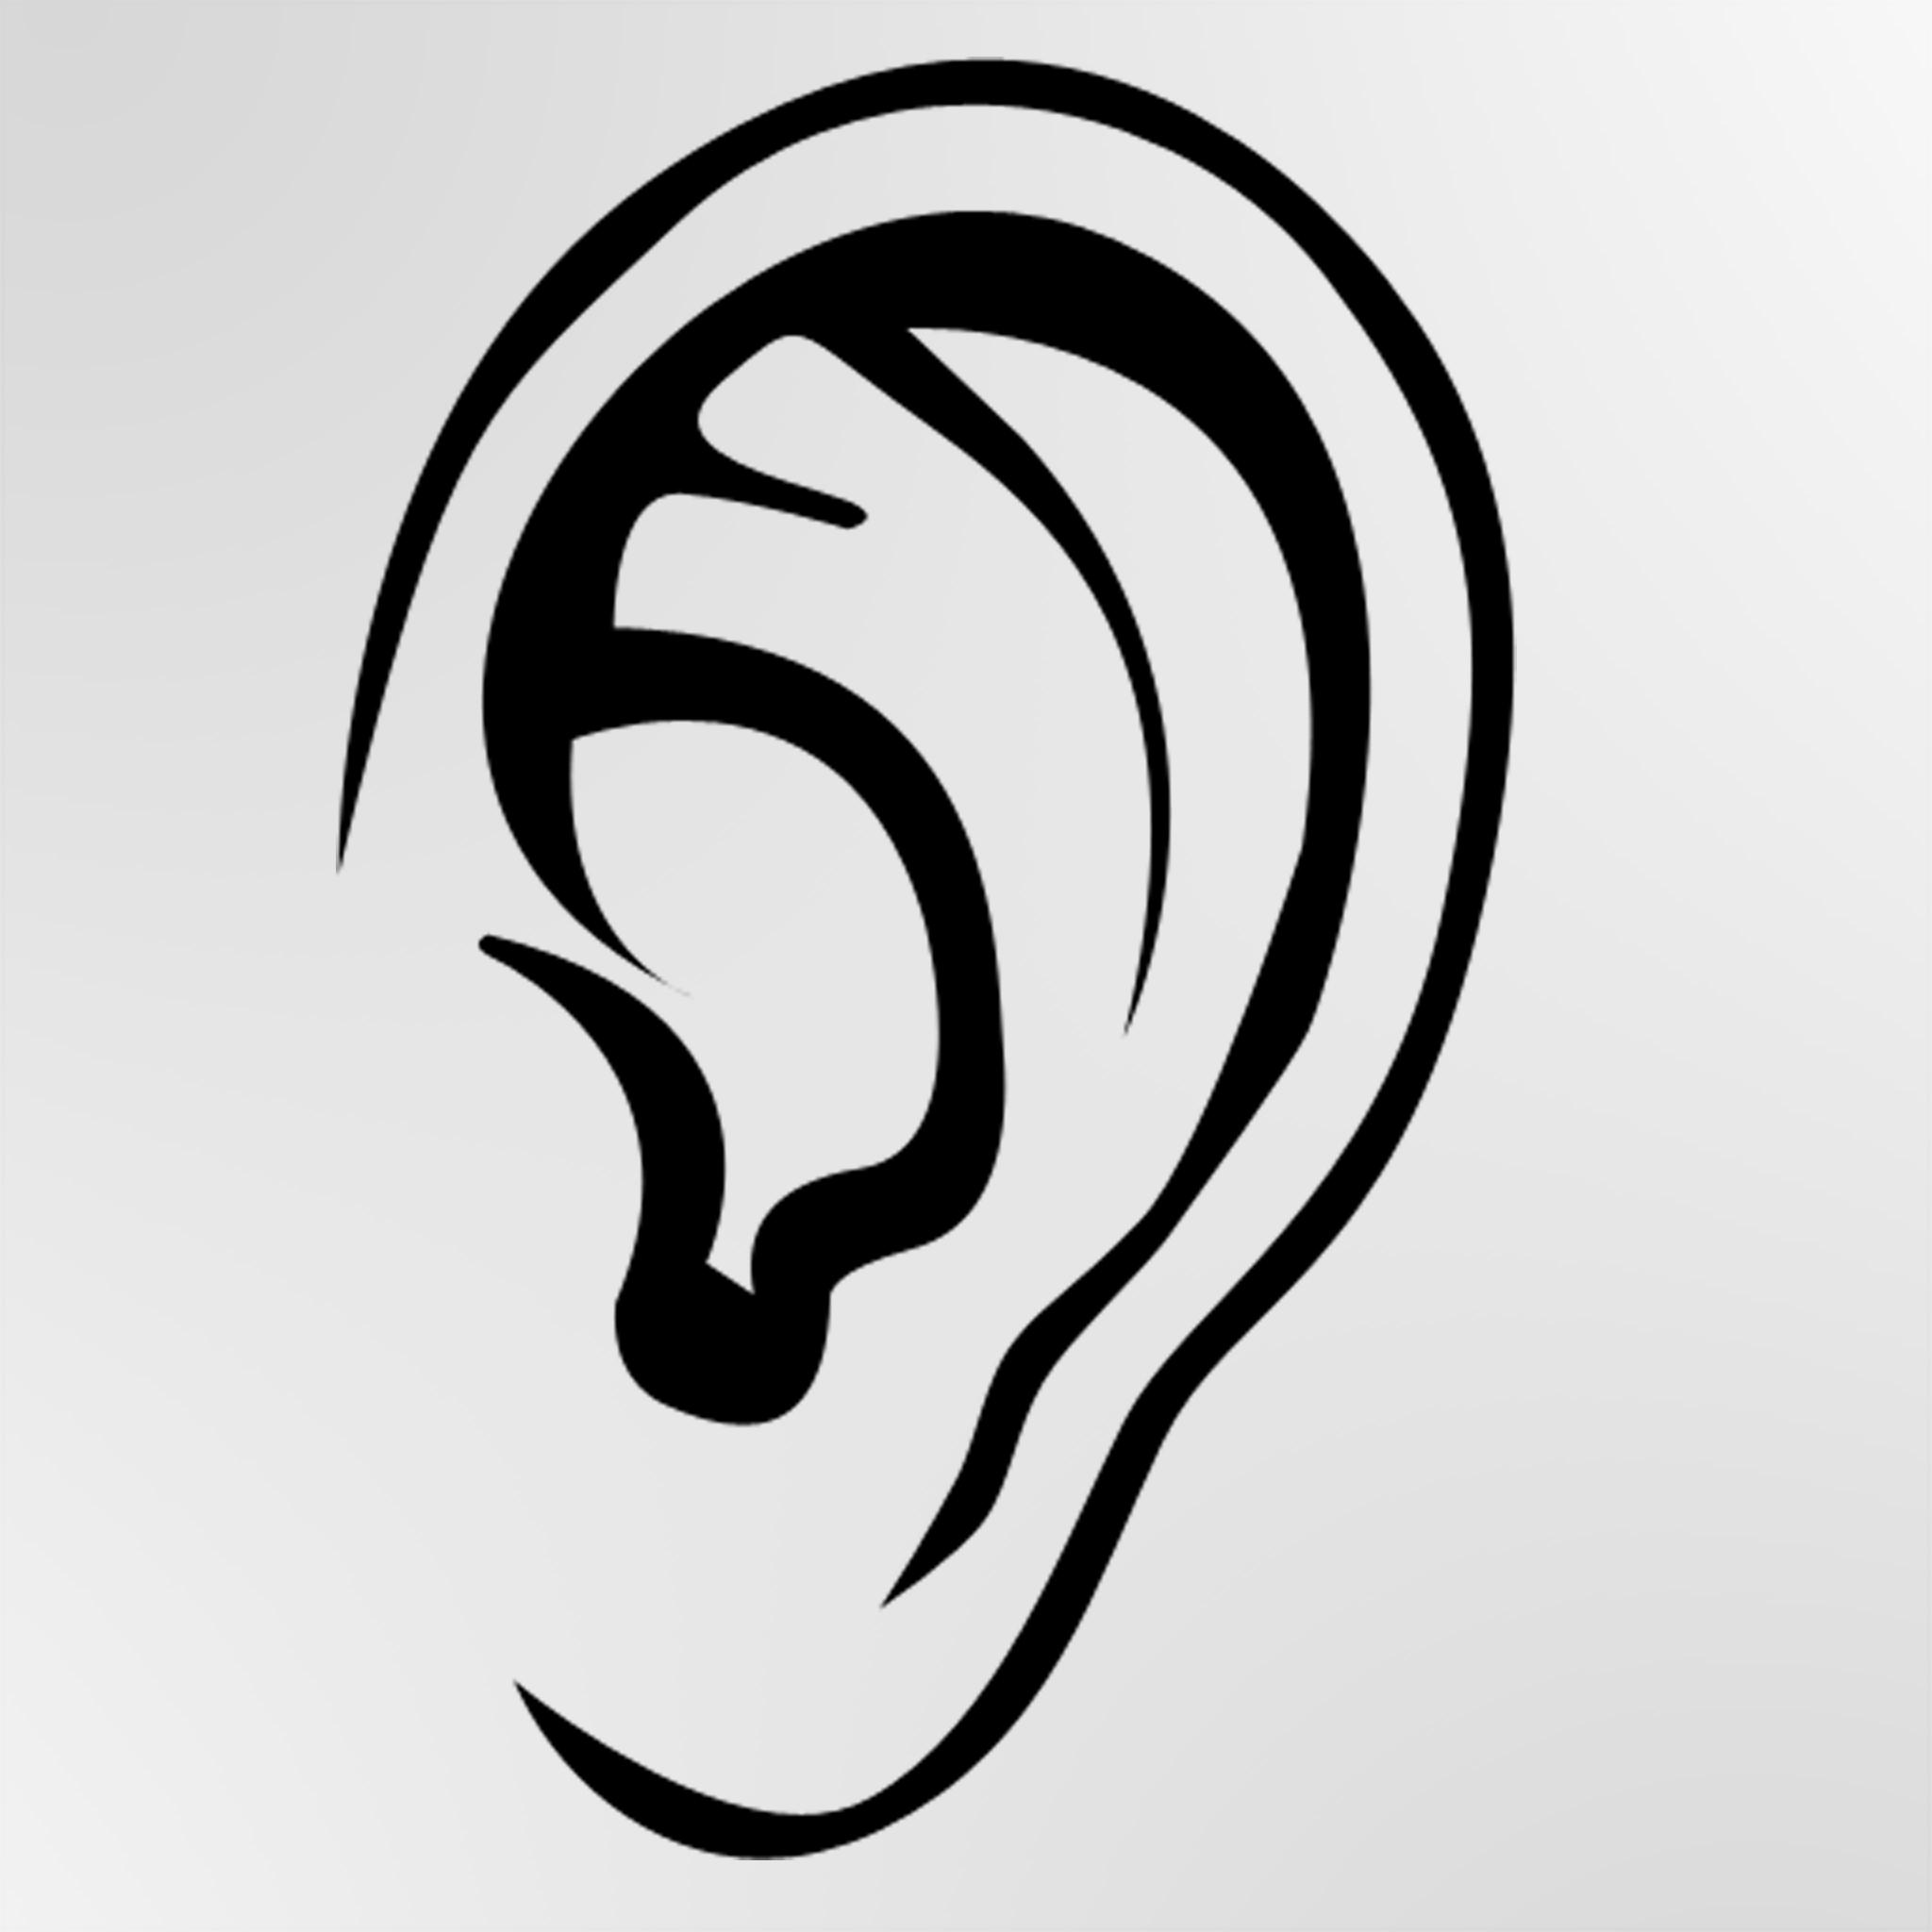 Ear clip art free clipart images 3